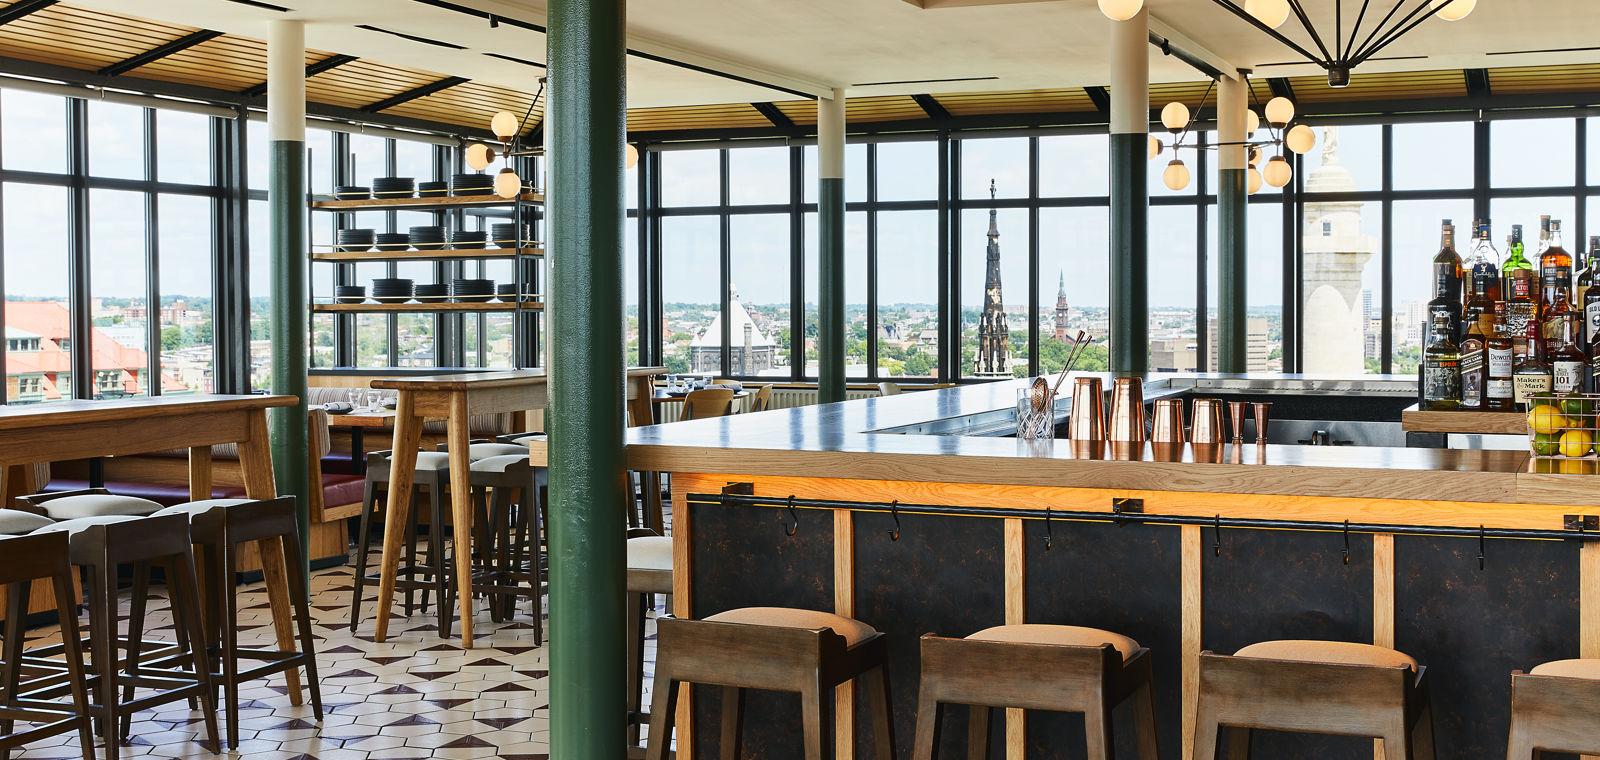 Hotel Revival Topside Restaurant and Bar